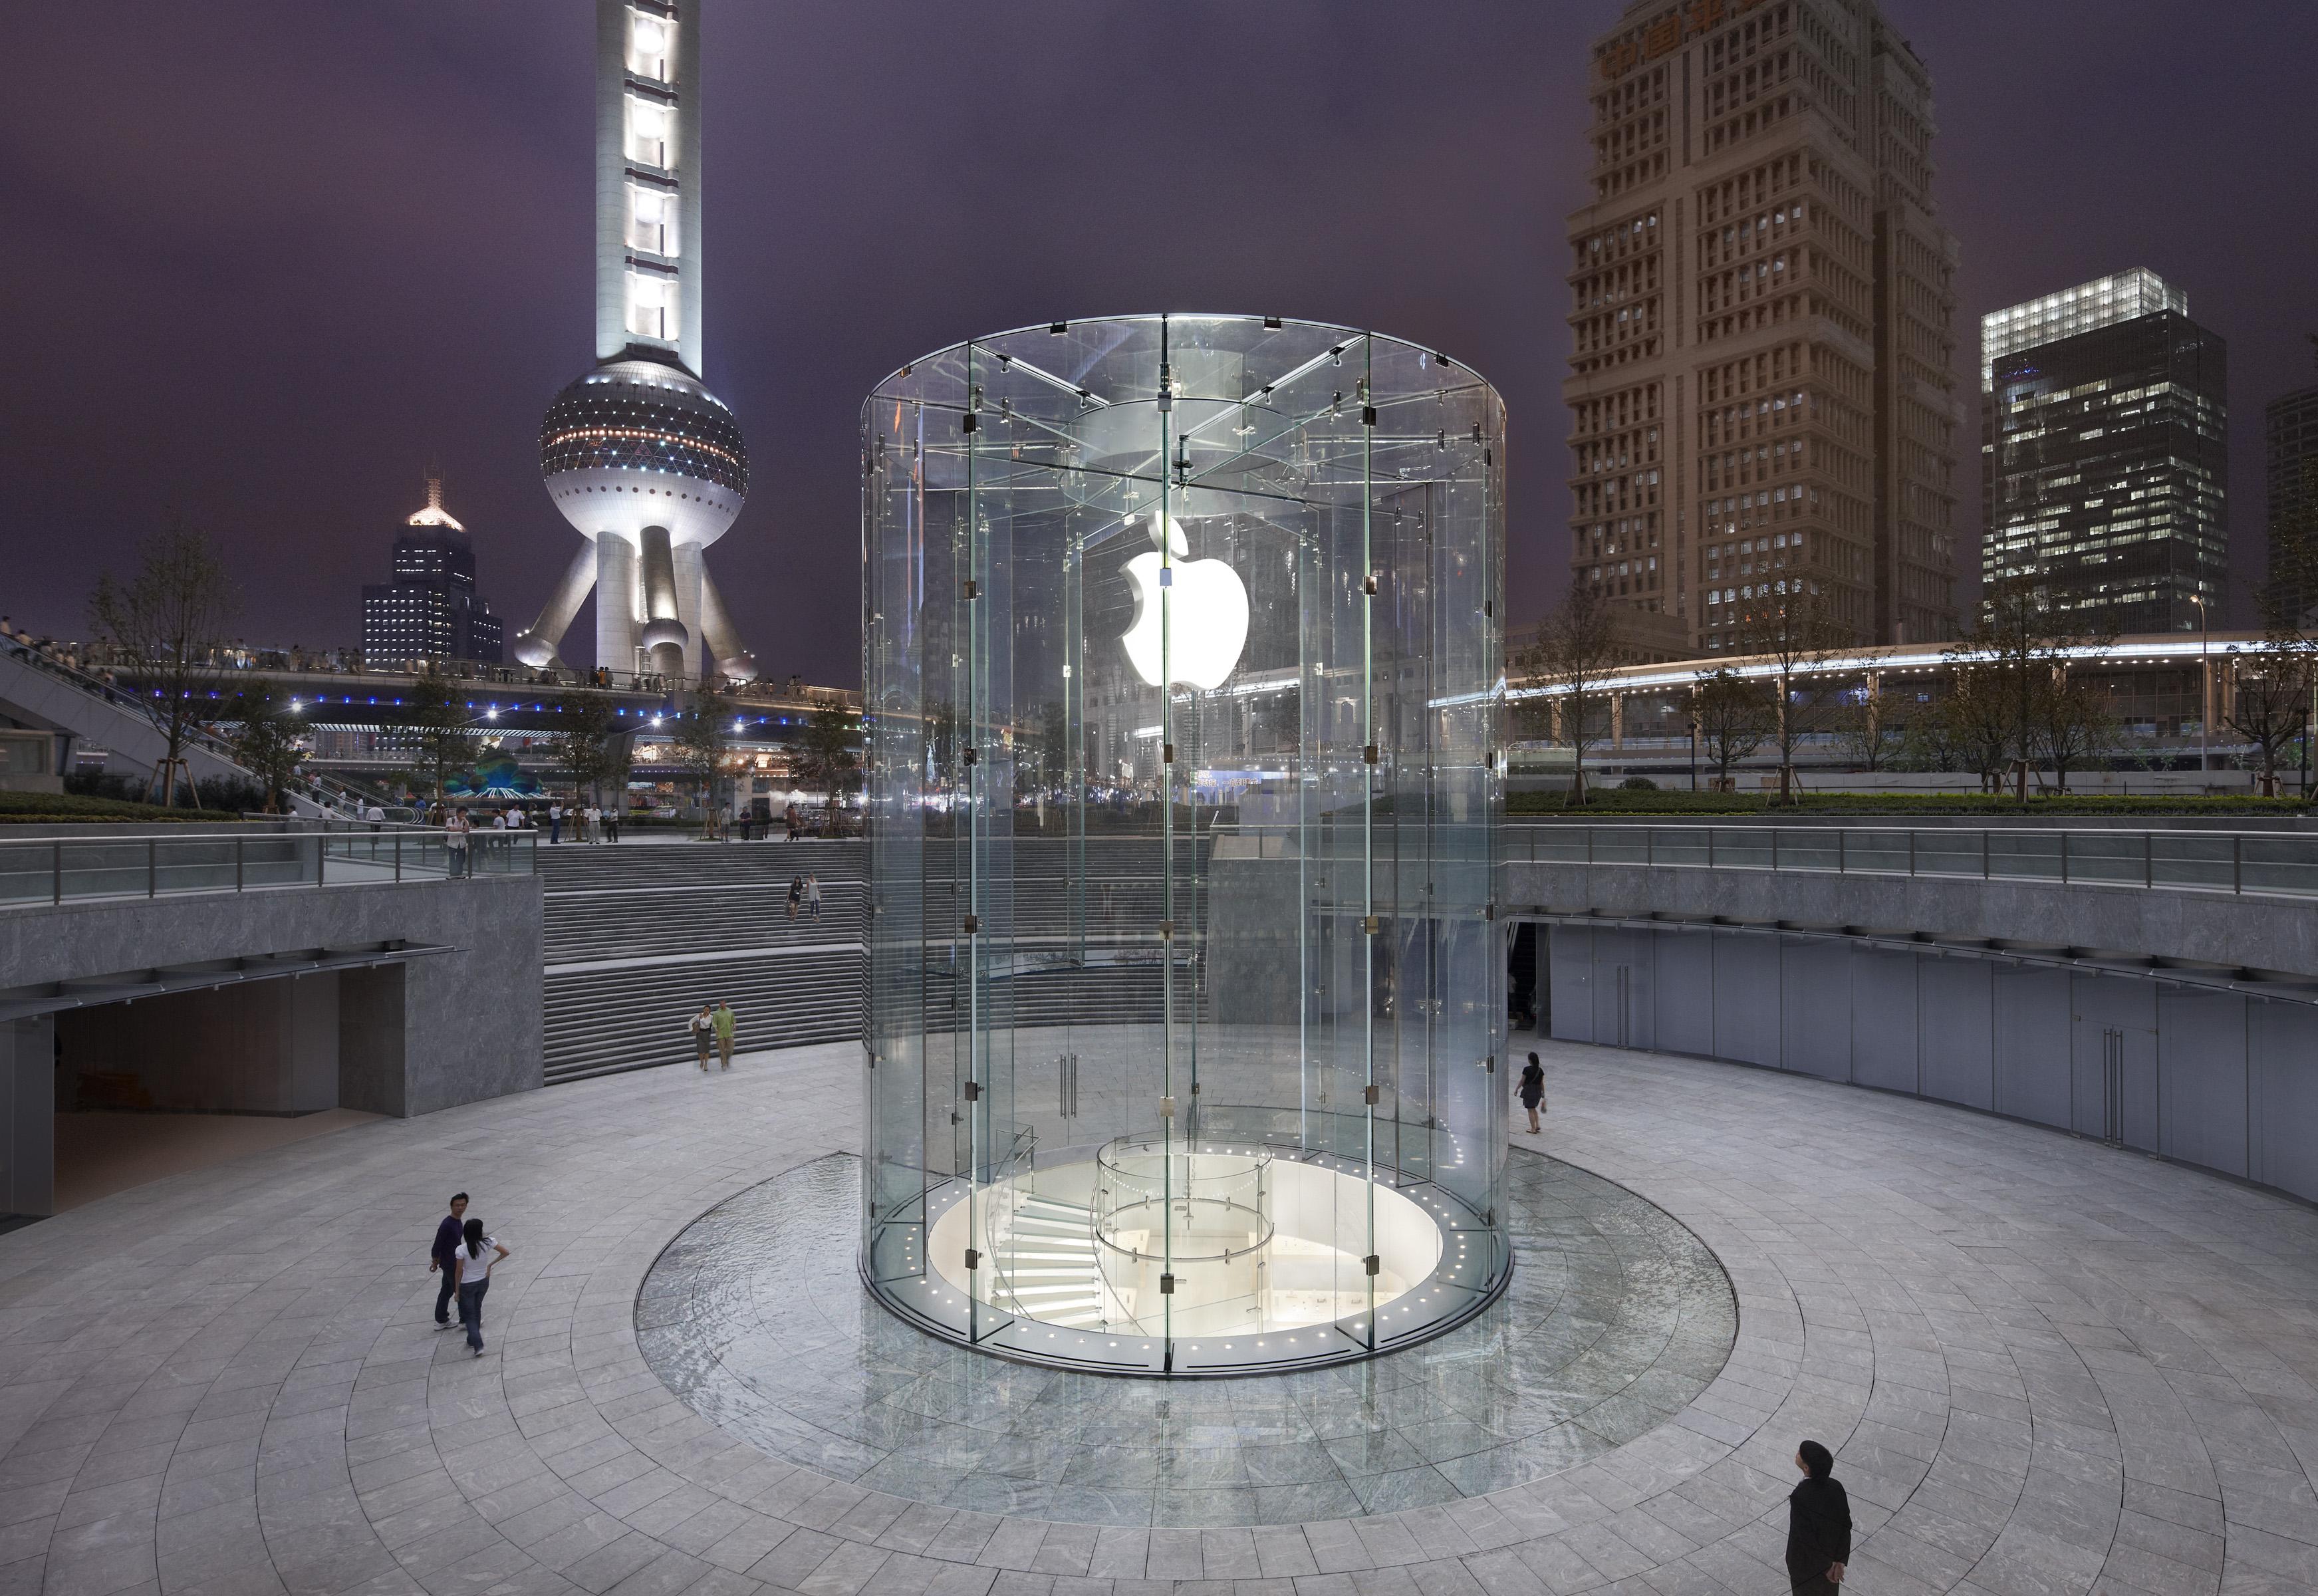 Apple Store Pudong | Architect Magazine